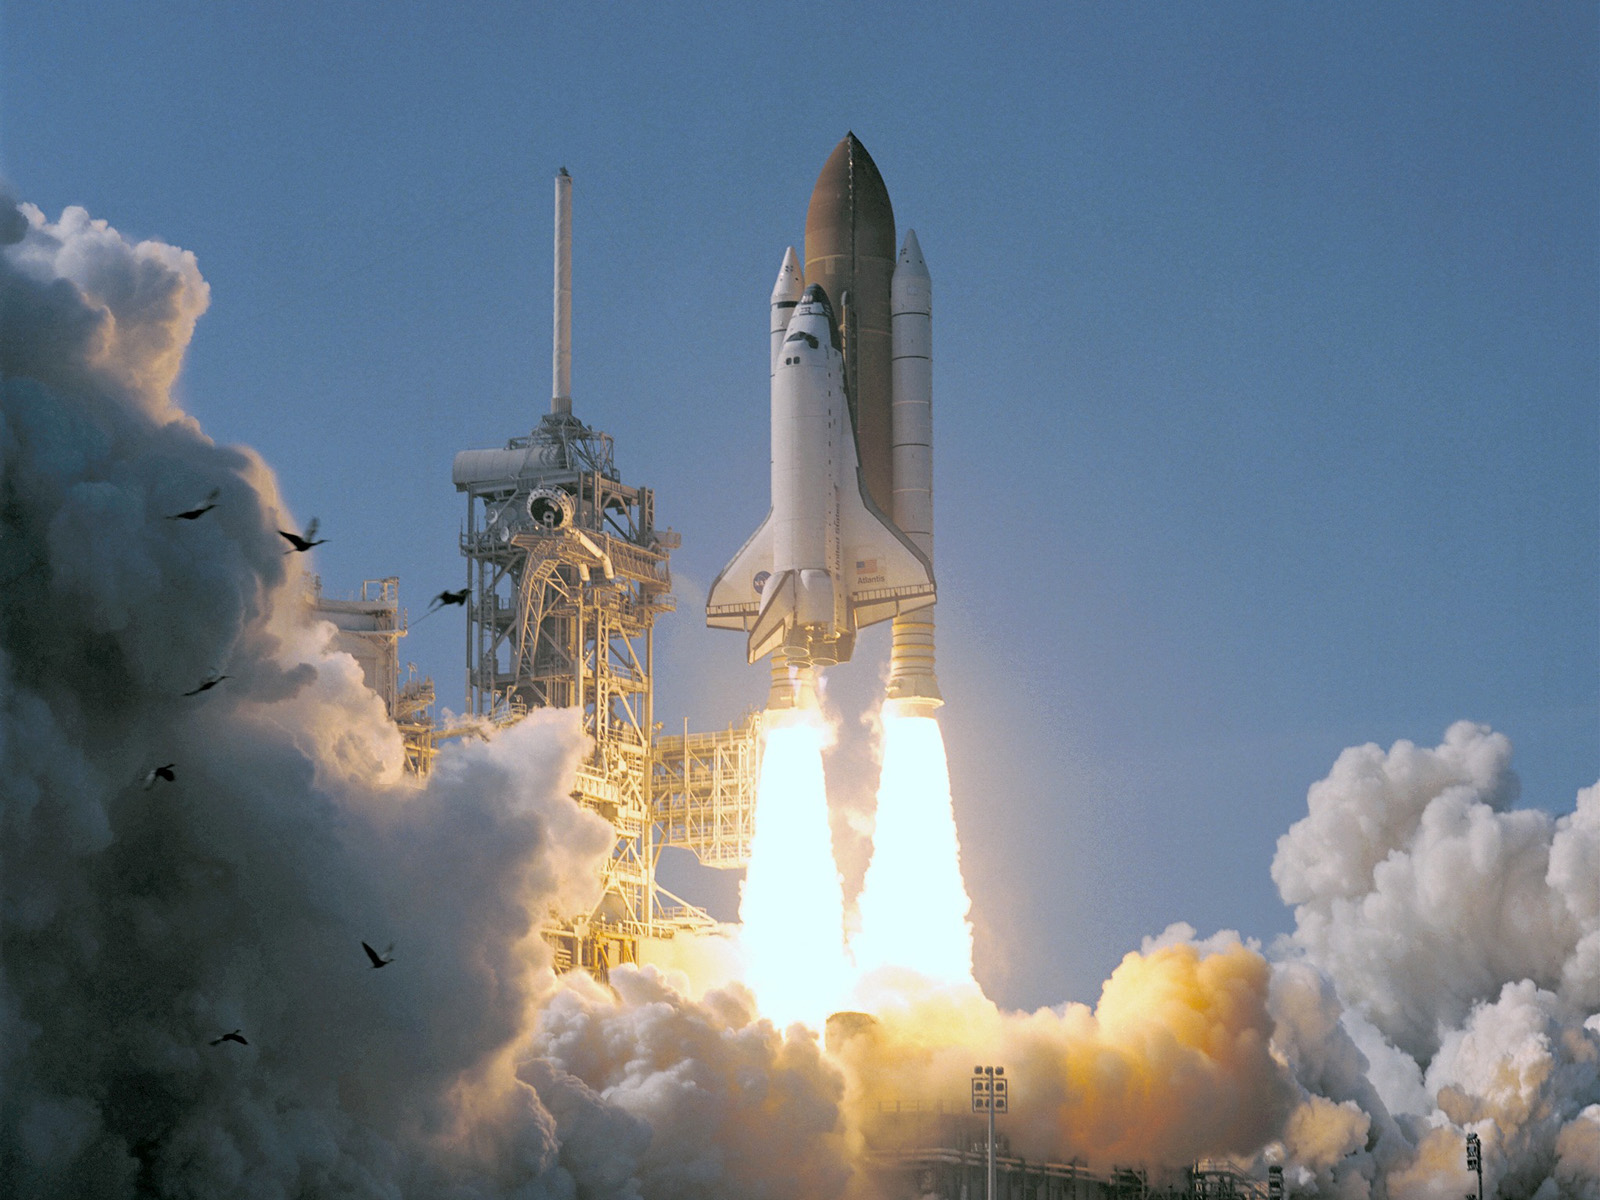 space shuttle columbia wallpaper - photo #13